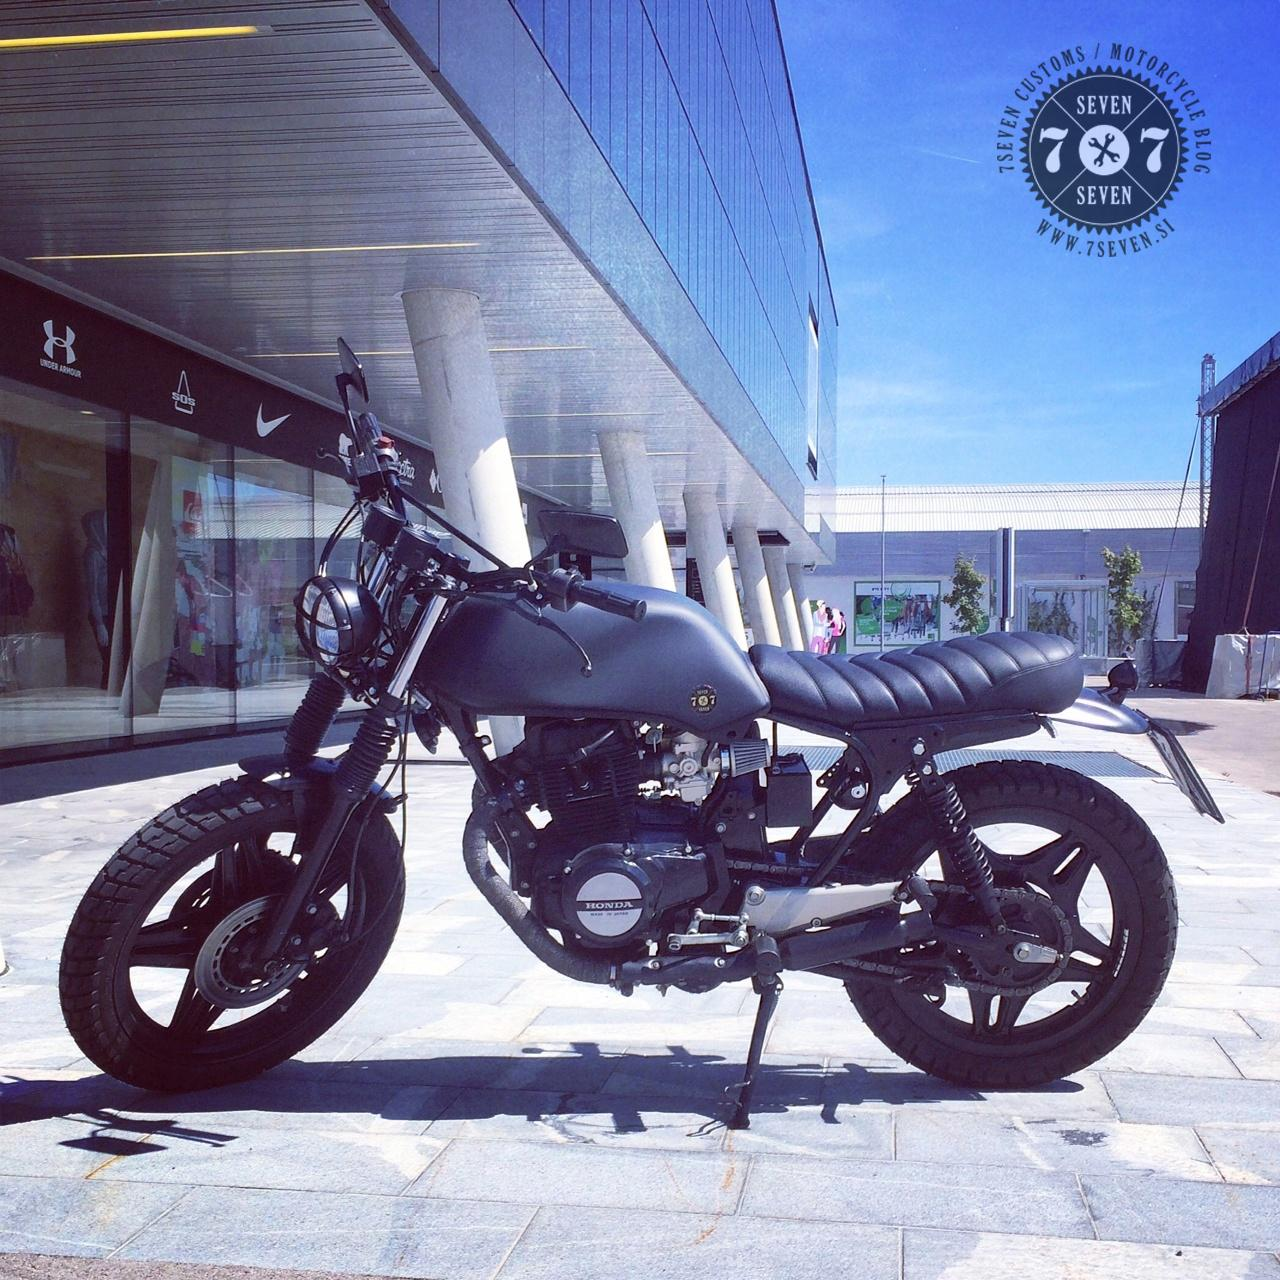 7seven Customs Scrambler 400 Donor Bike 1982 Honda CB400